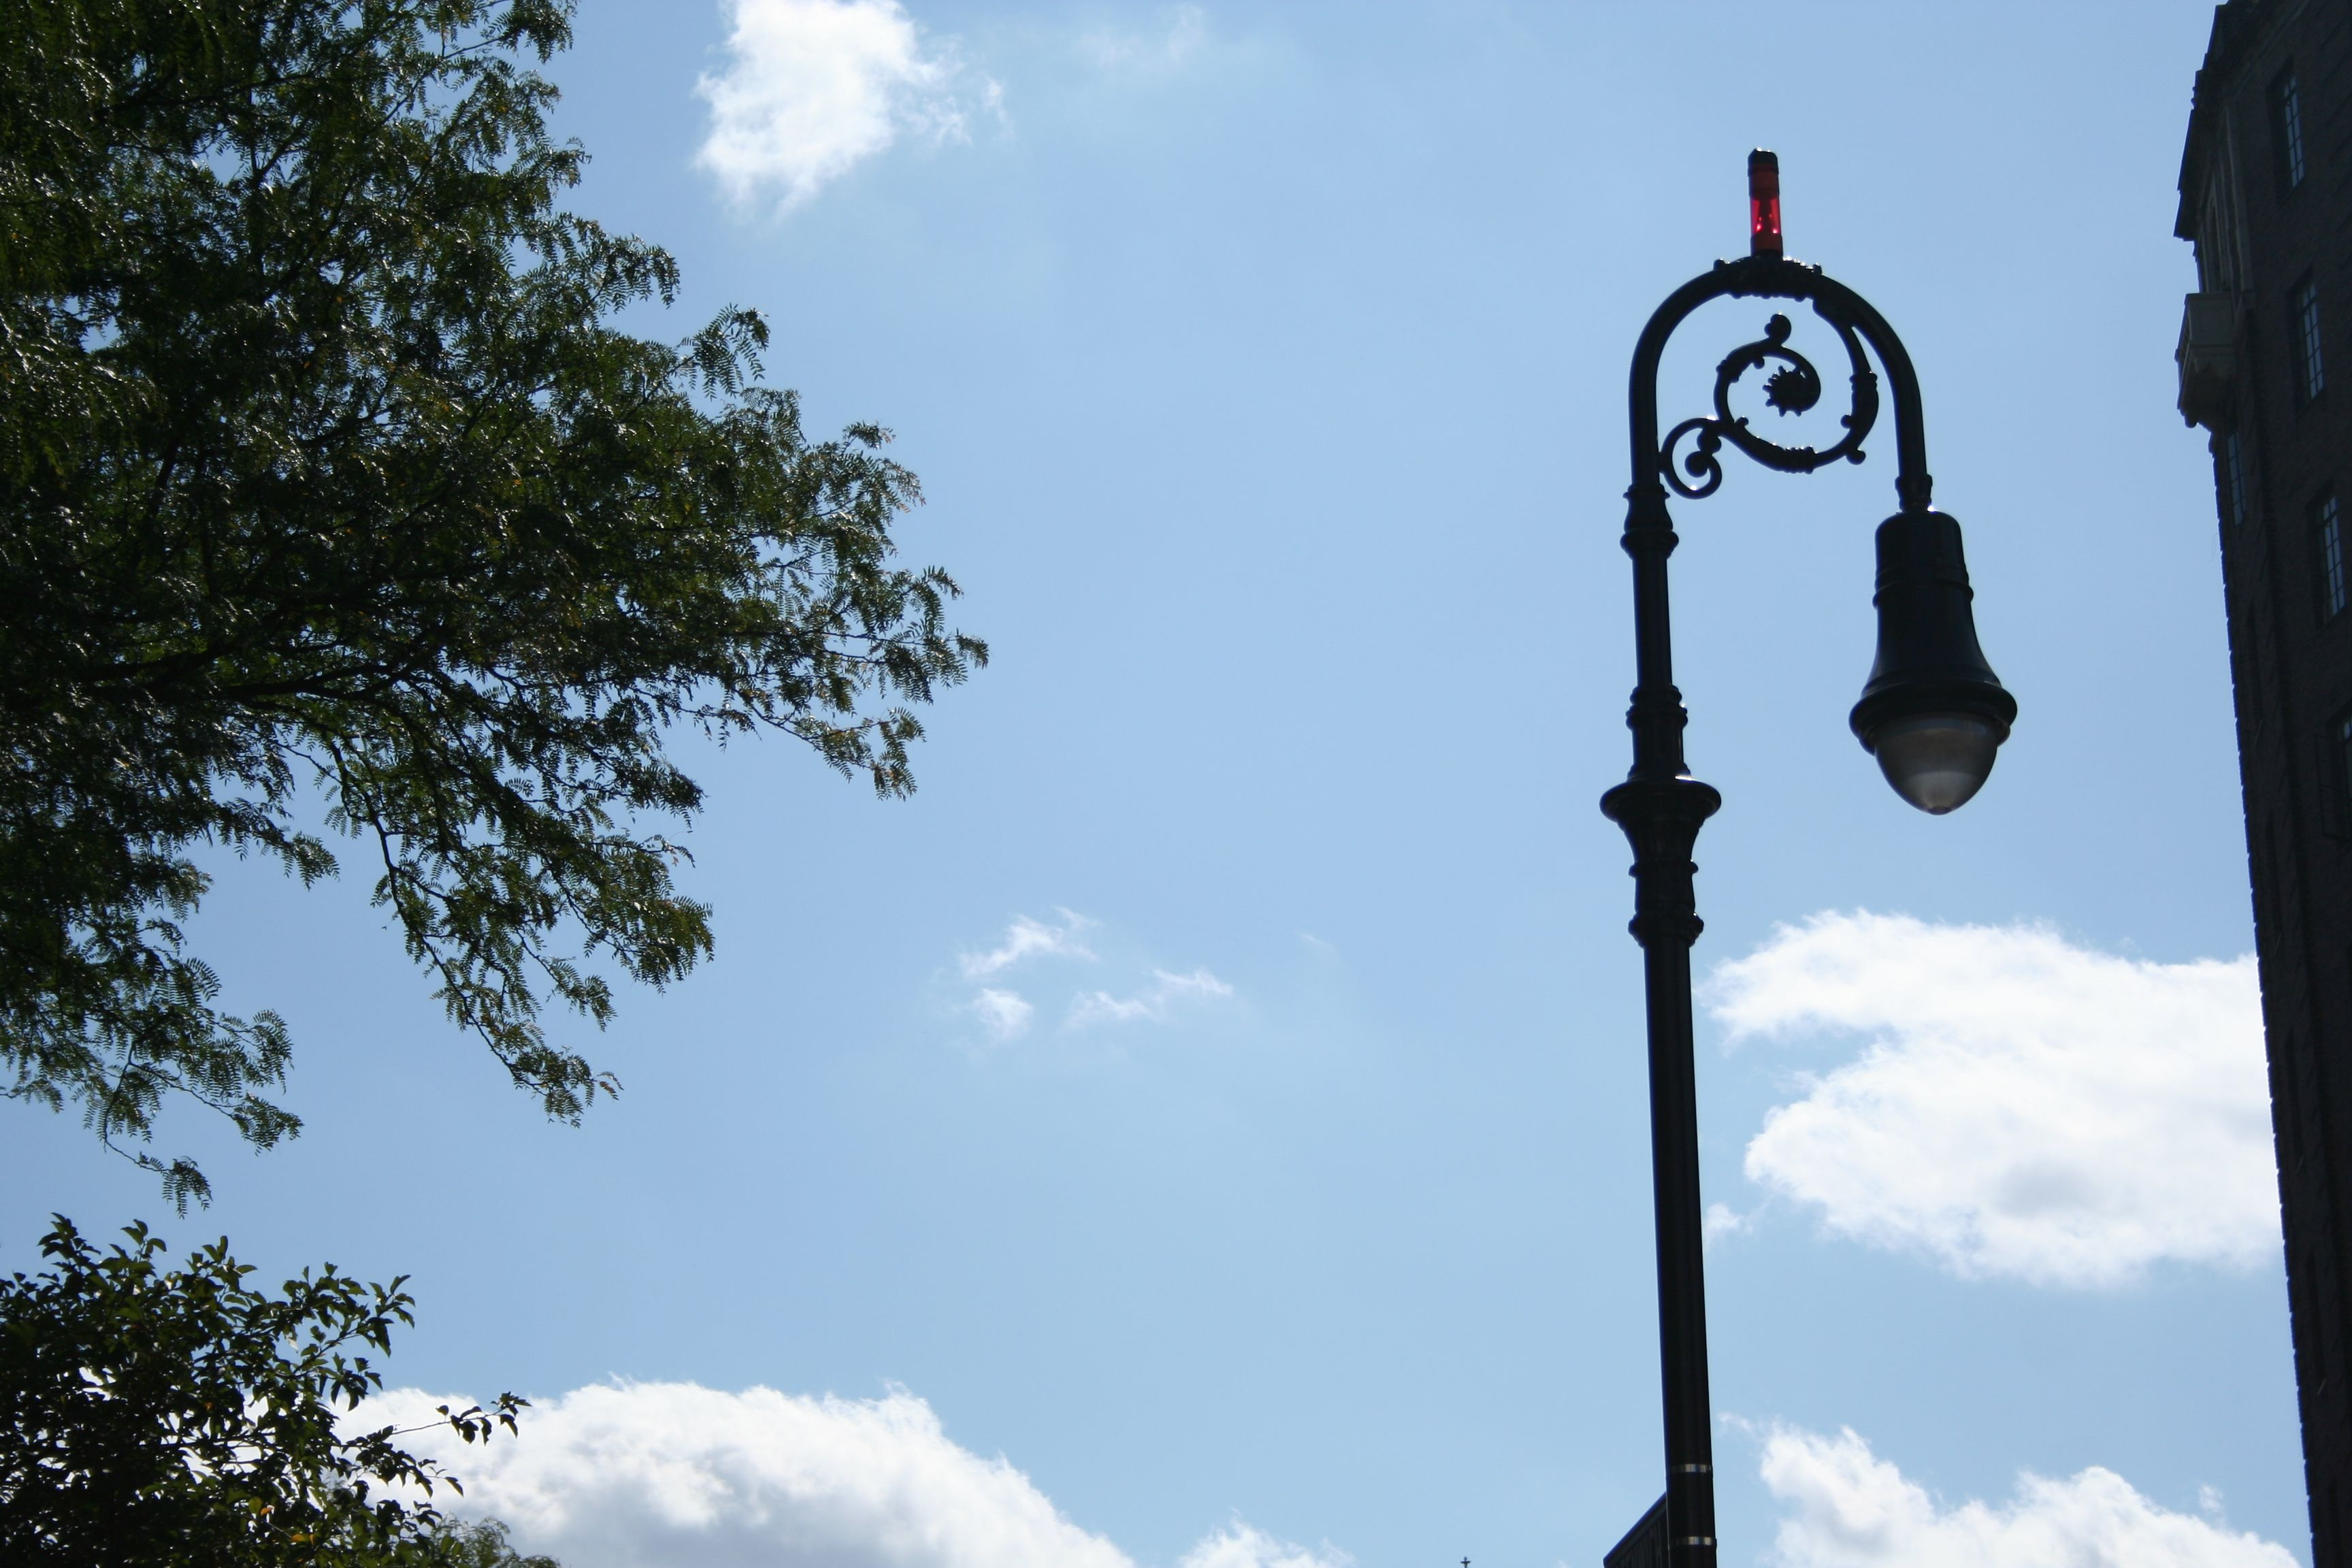 Historic Lamp Post Lamp Post Street Lamp Post Lantern Post